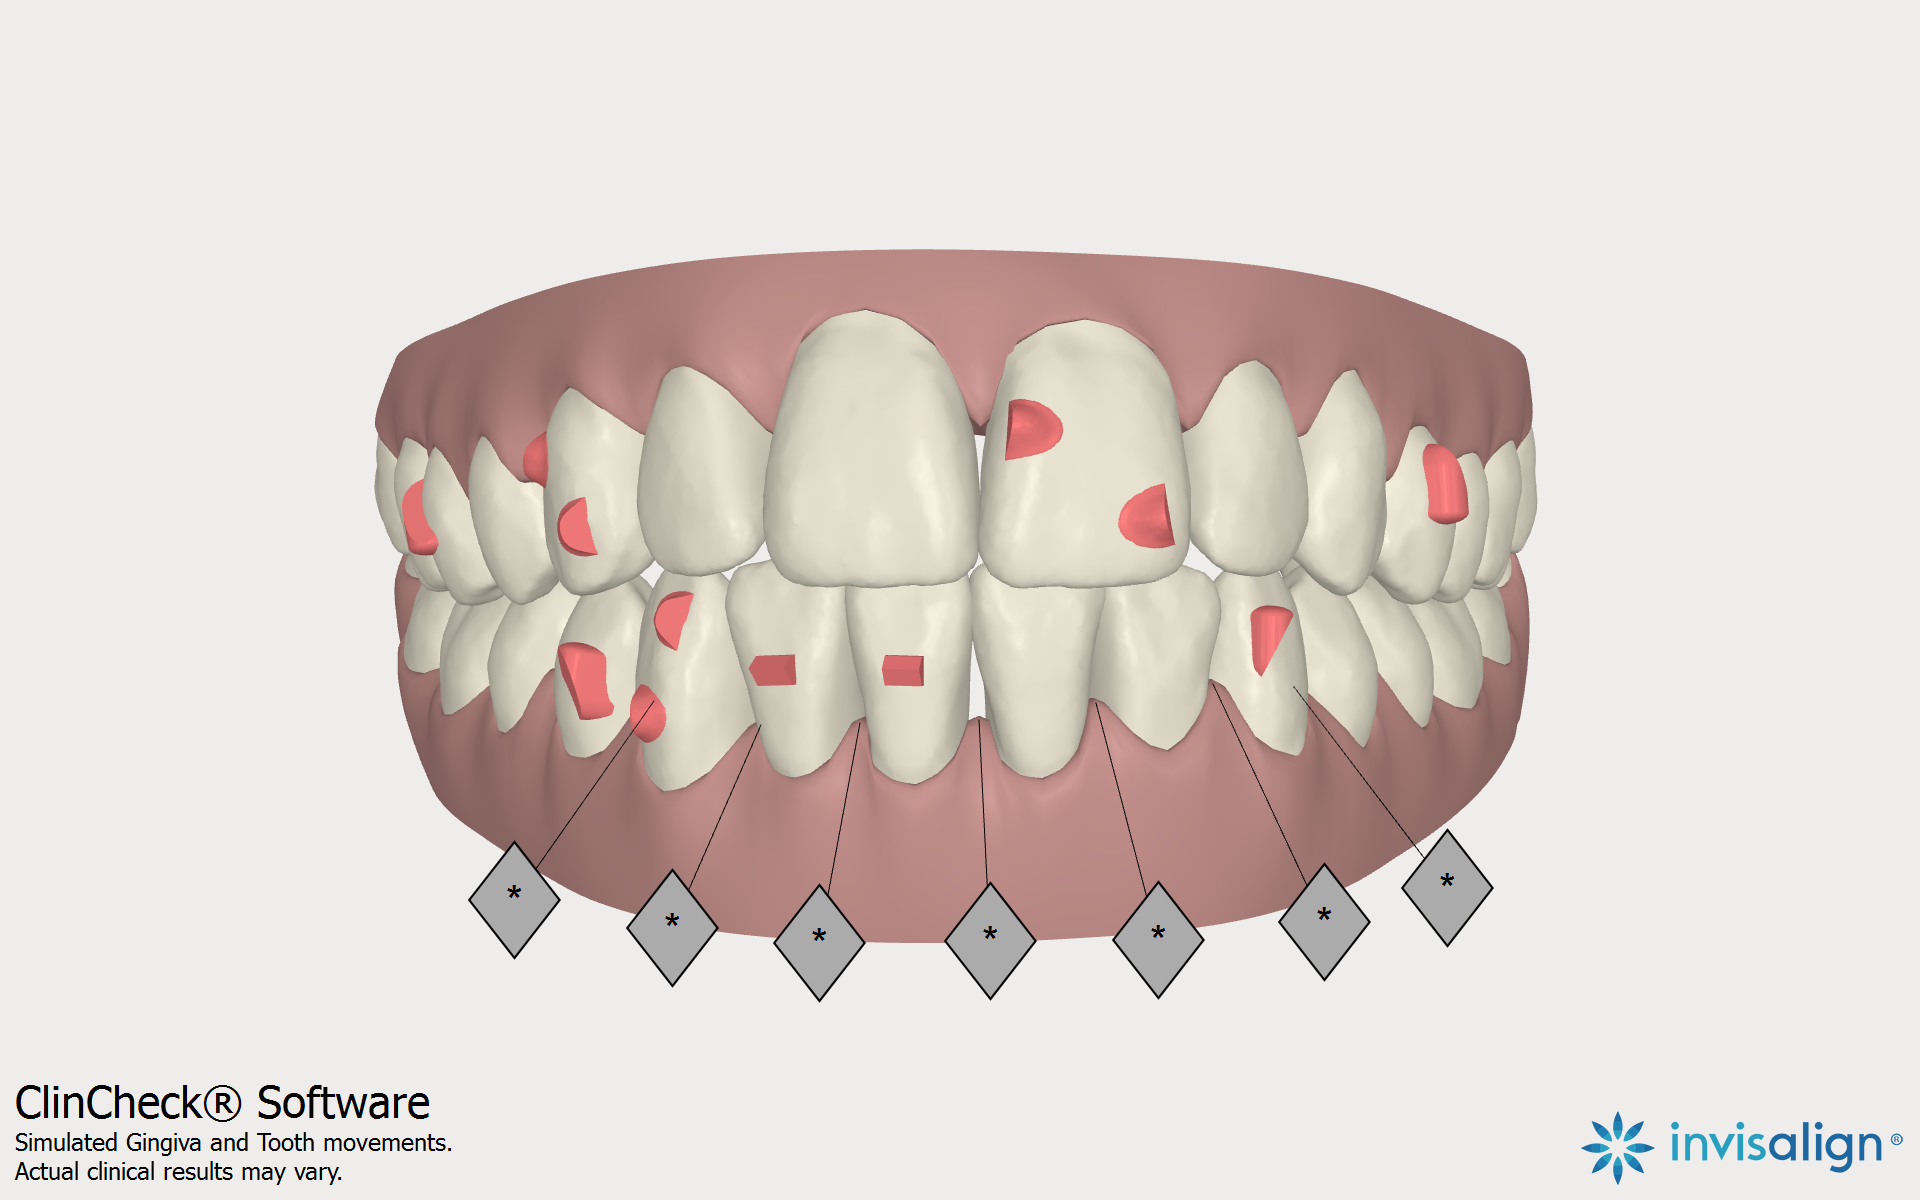 Invisalign Orthodontic Records and ClinCheck